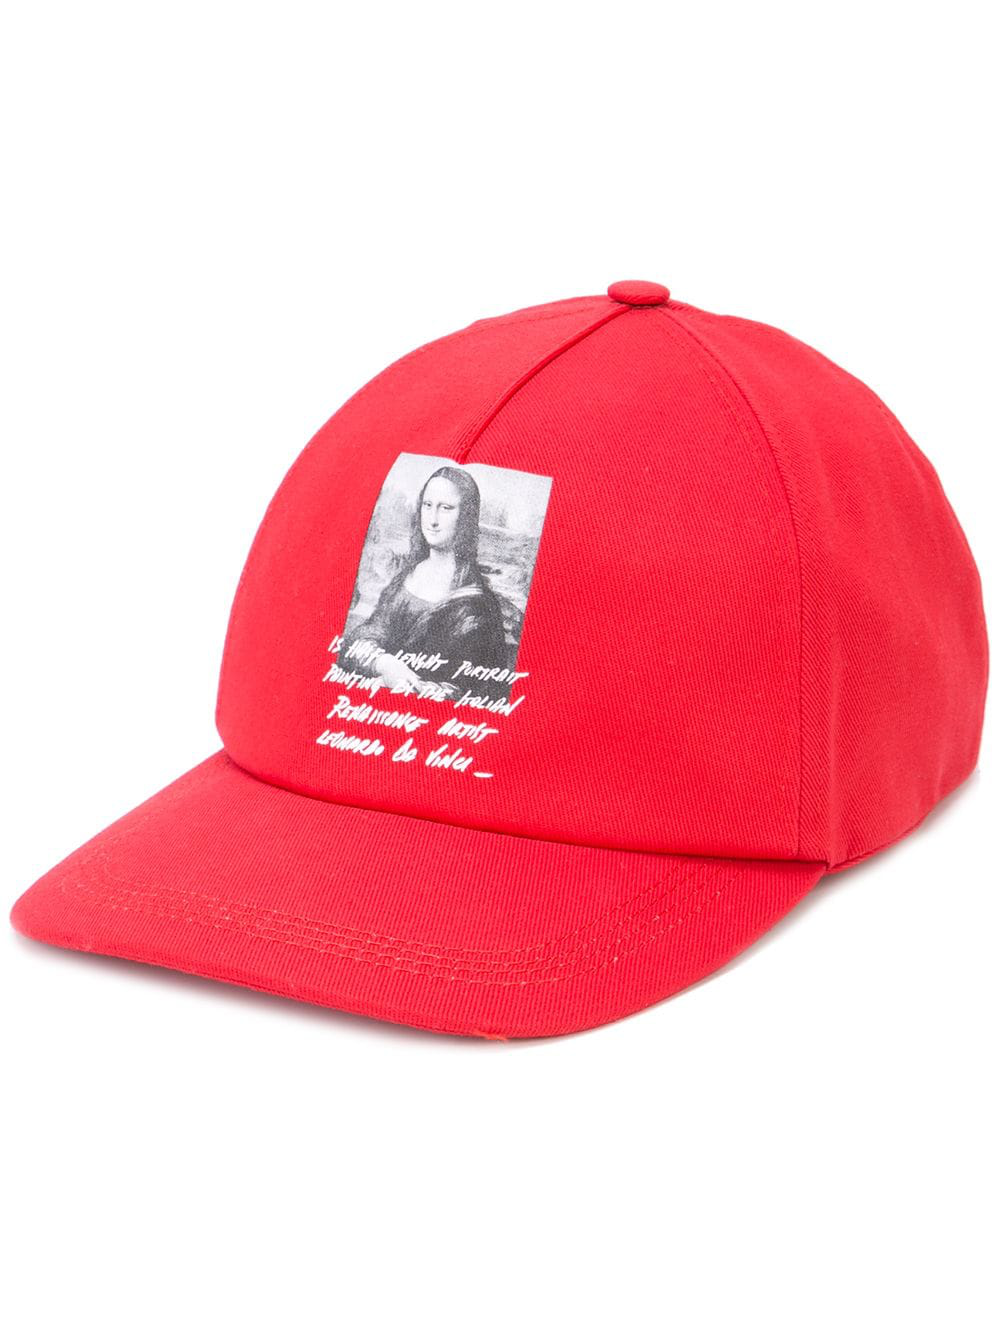 67057f6bb9b Off-White Mona Lisa Printed Cap - Farfetch In Red   ModeSens